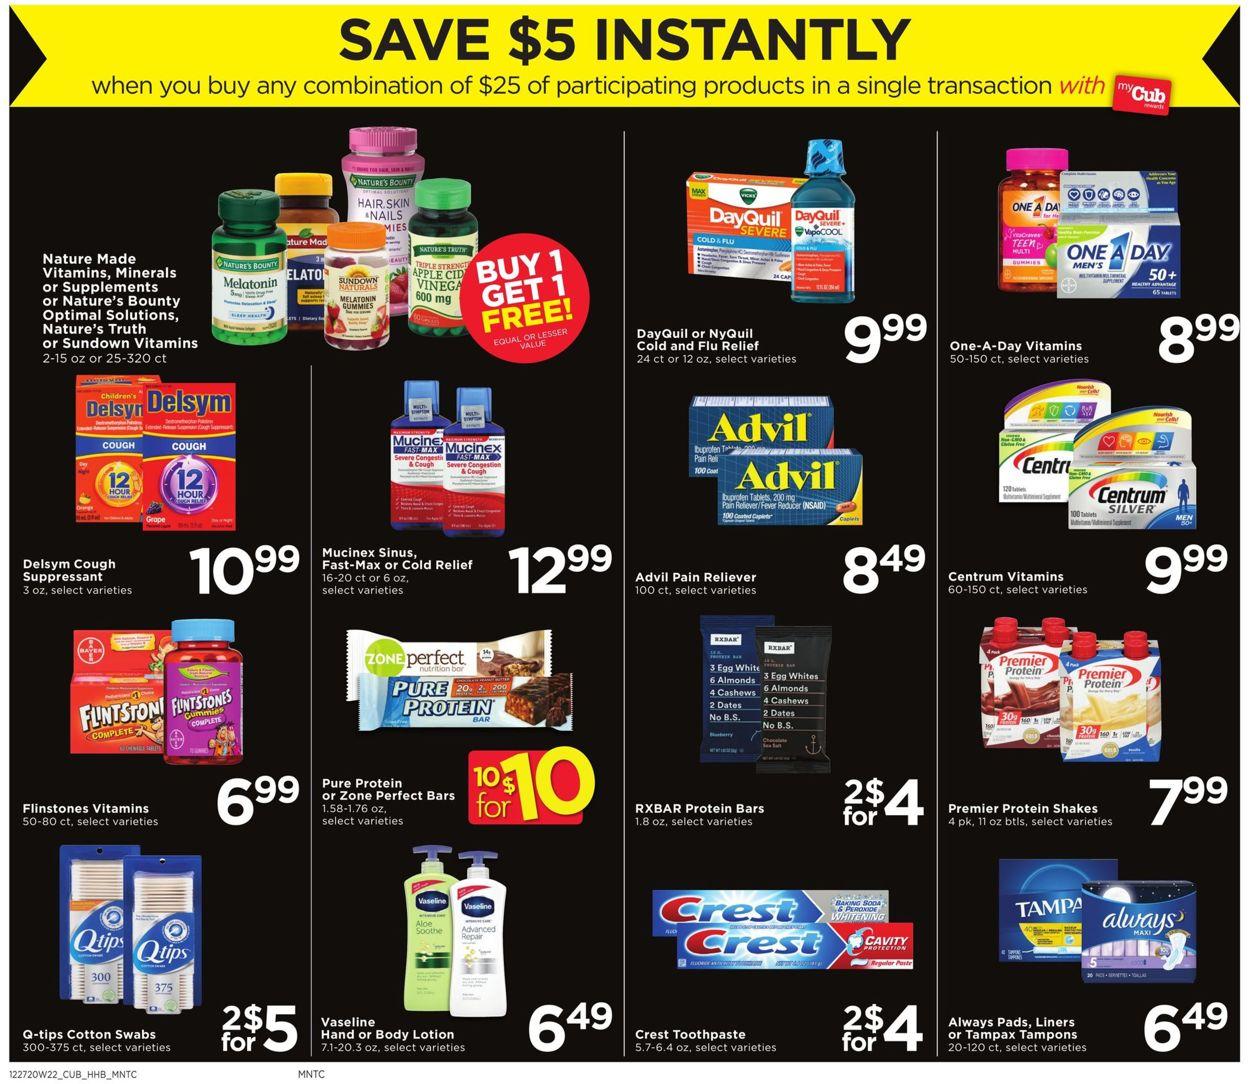 Cub Foods SAVE $5 INSTANTLY Weekly Ad Circular - valid 12/27-01/02/2021